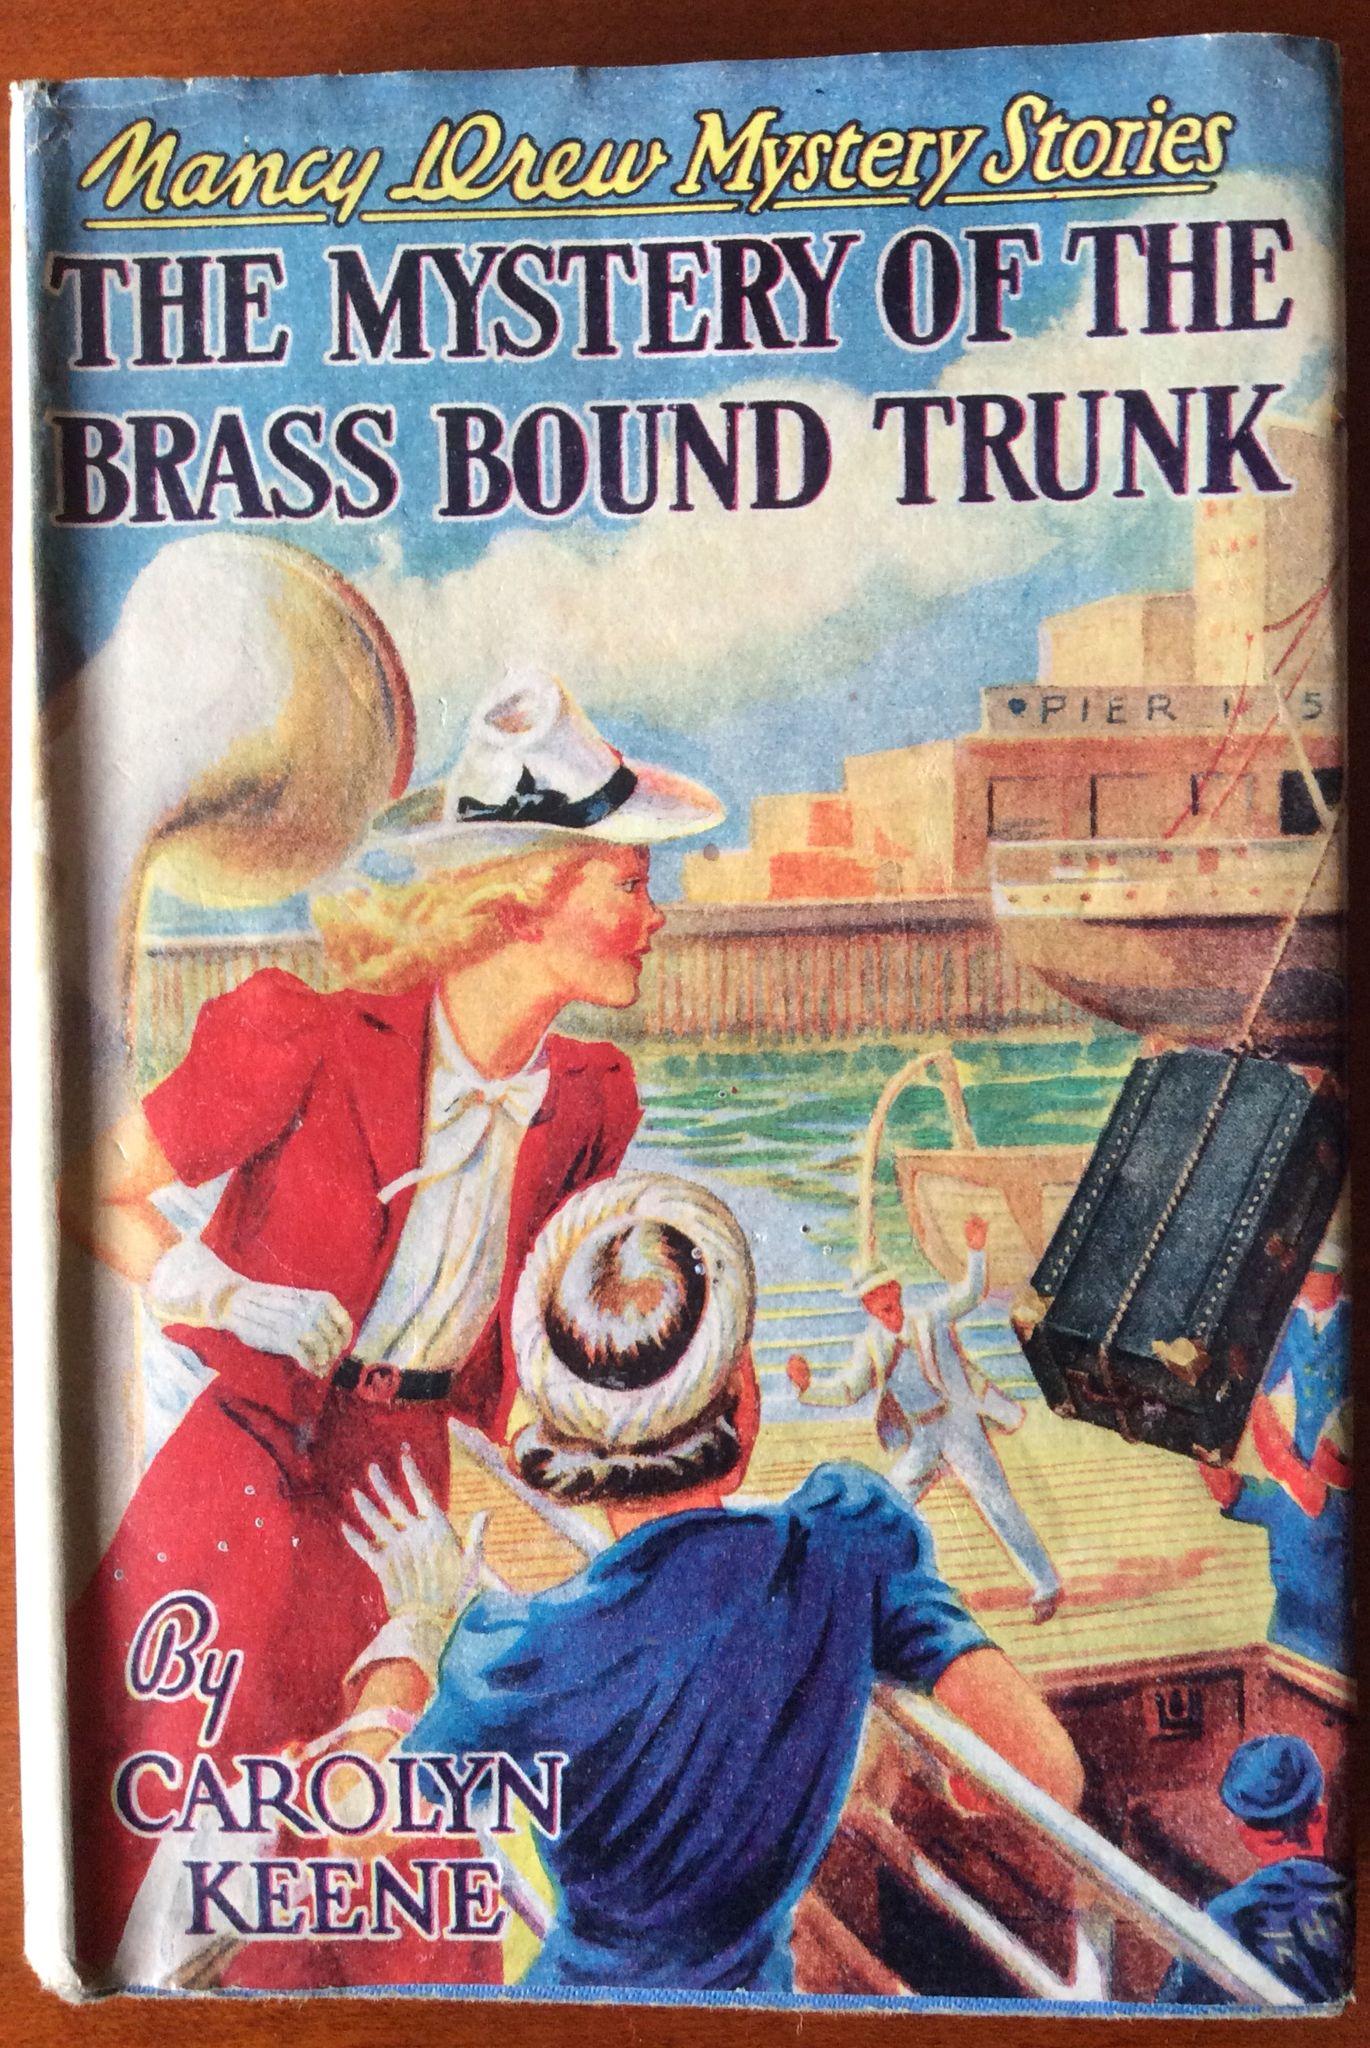 Nancy Drew Mystery Stories. The Mystery of the Brass Bound Trunk.